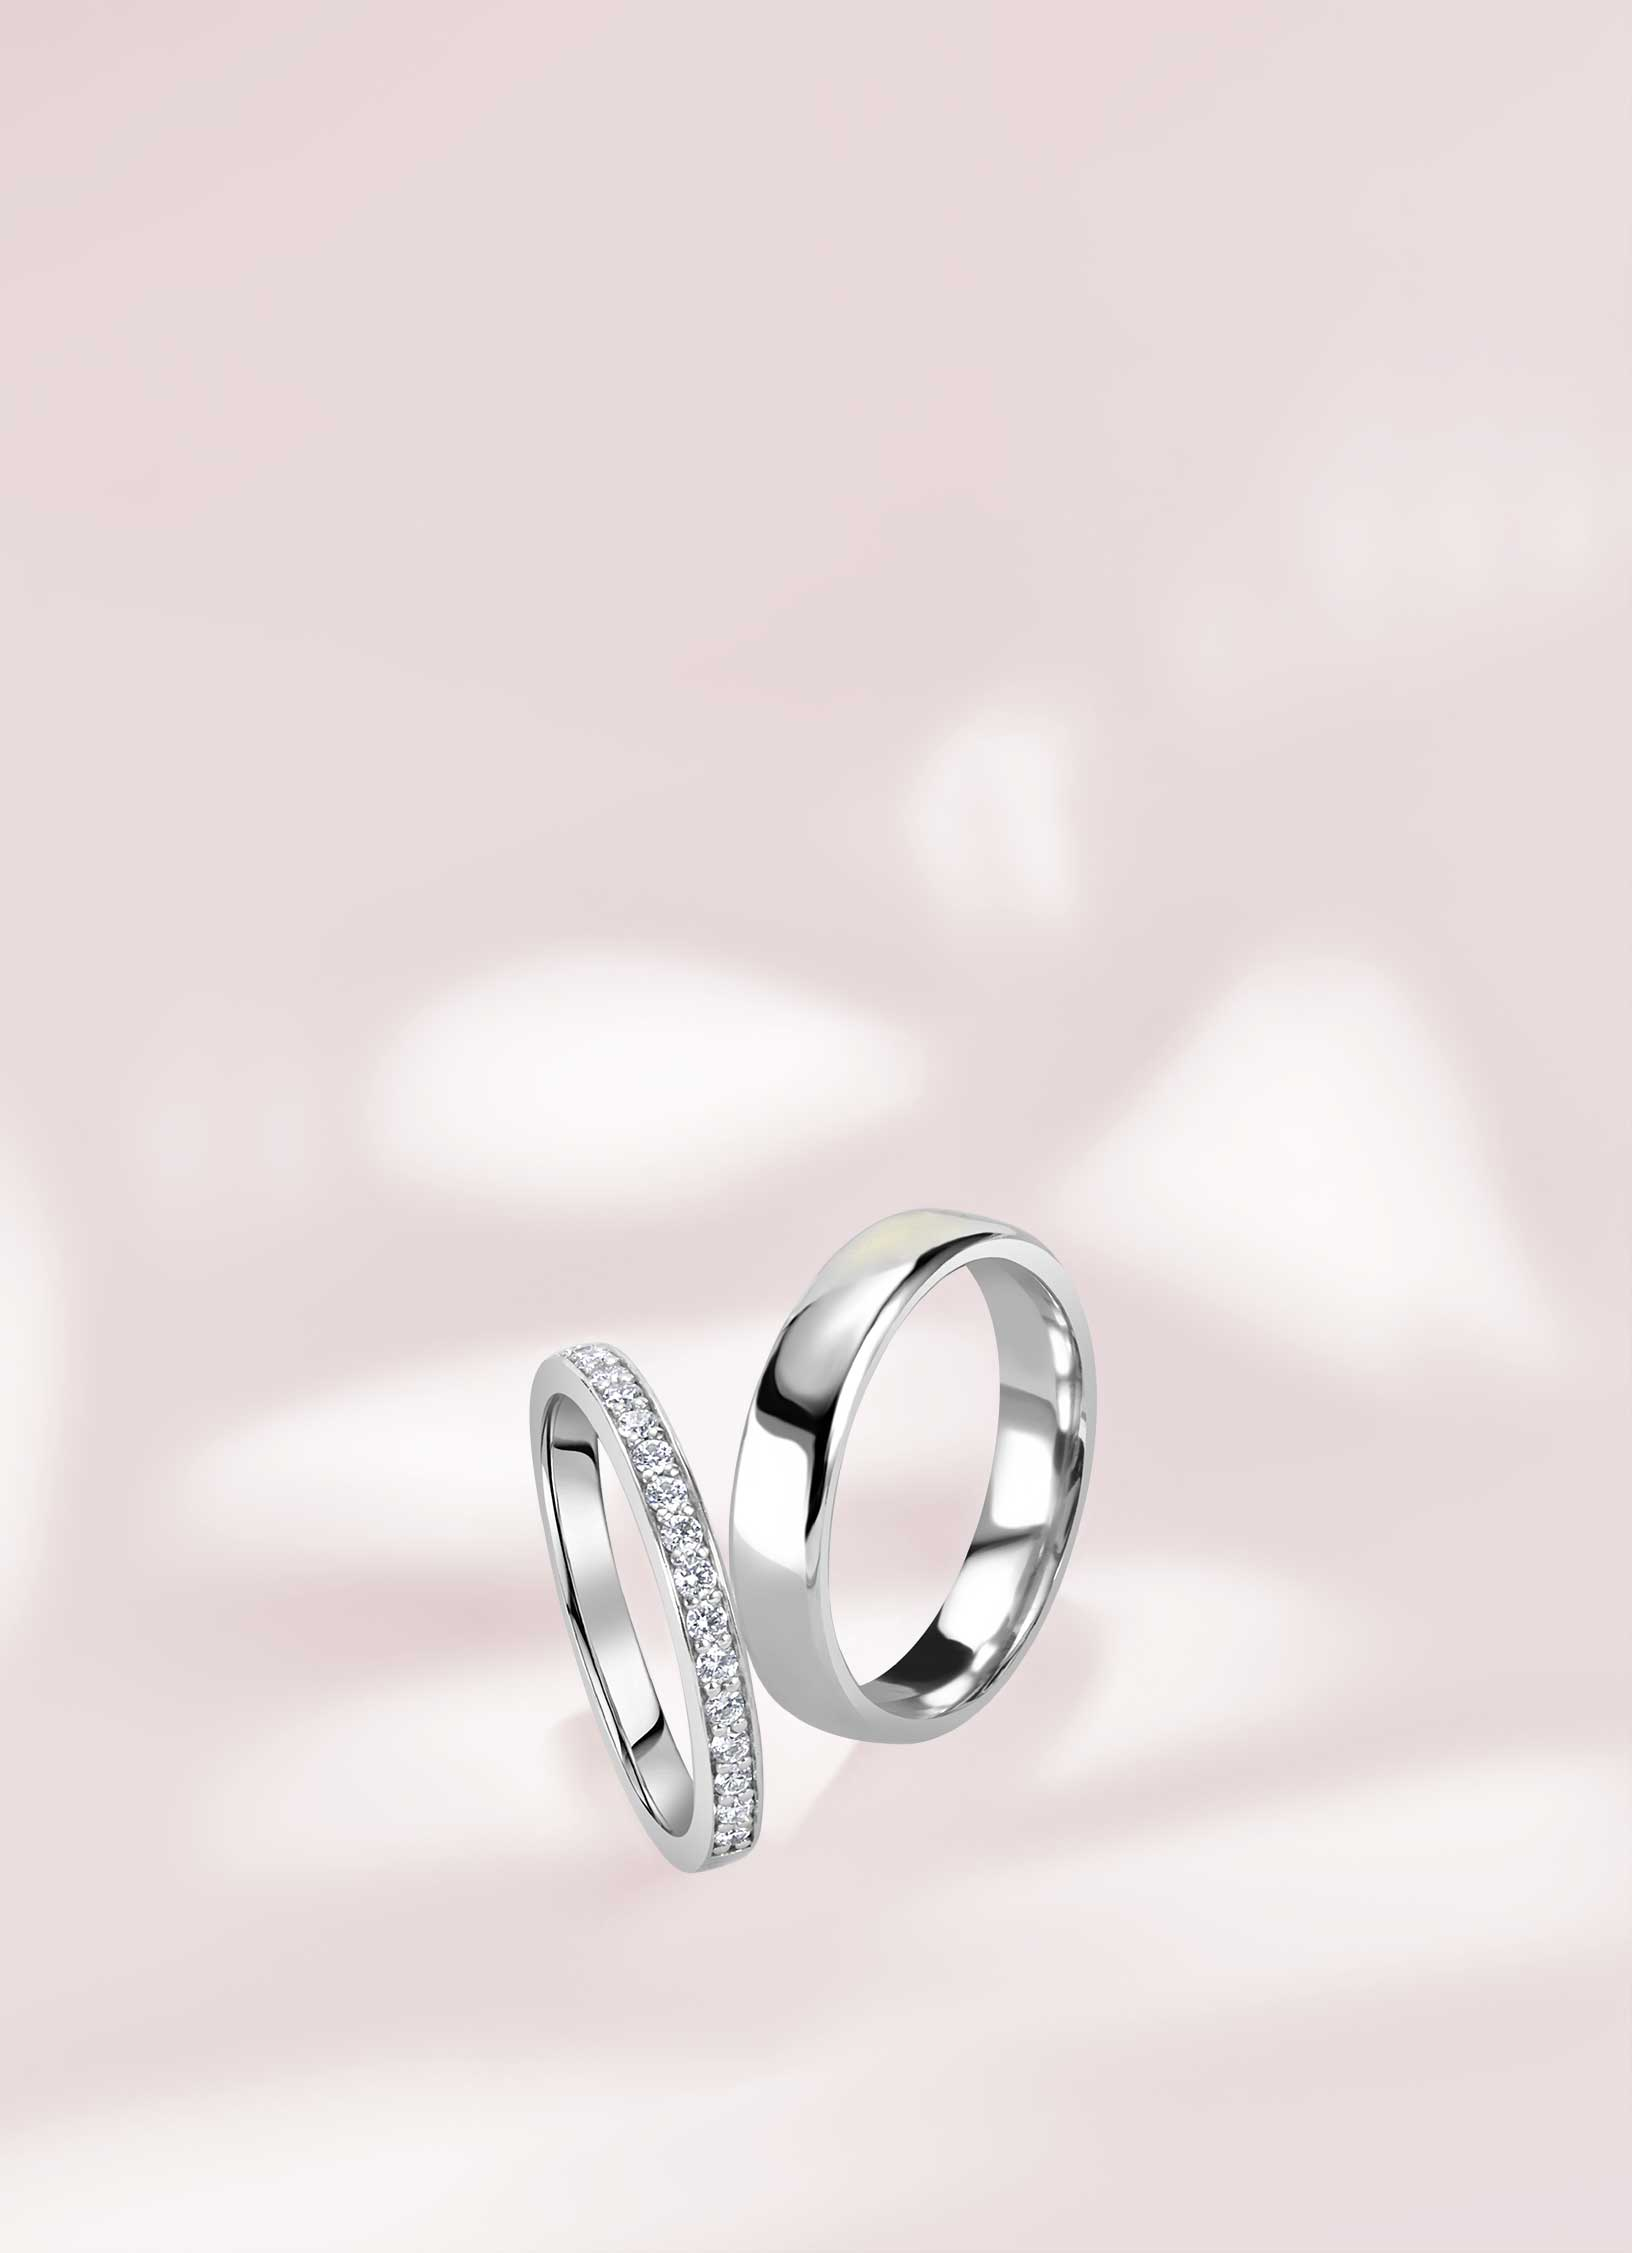 Palladium Wedding Rings - Steven Stone